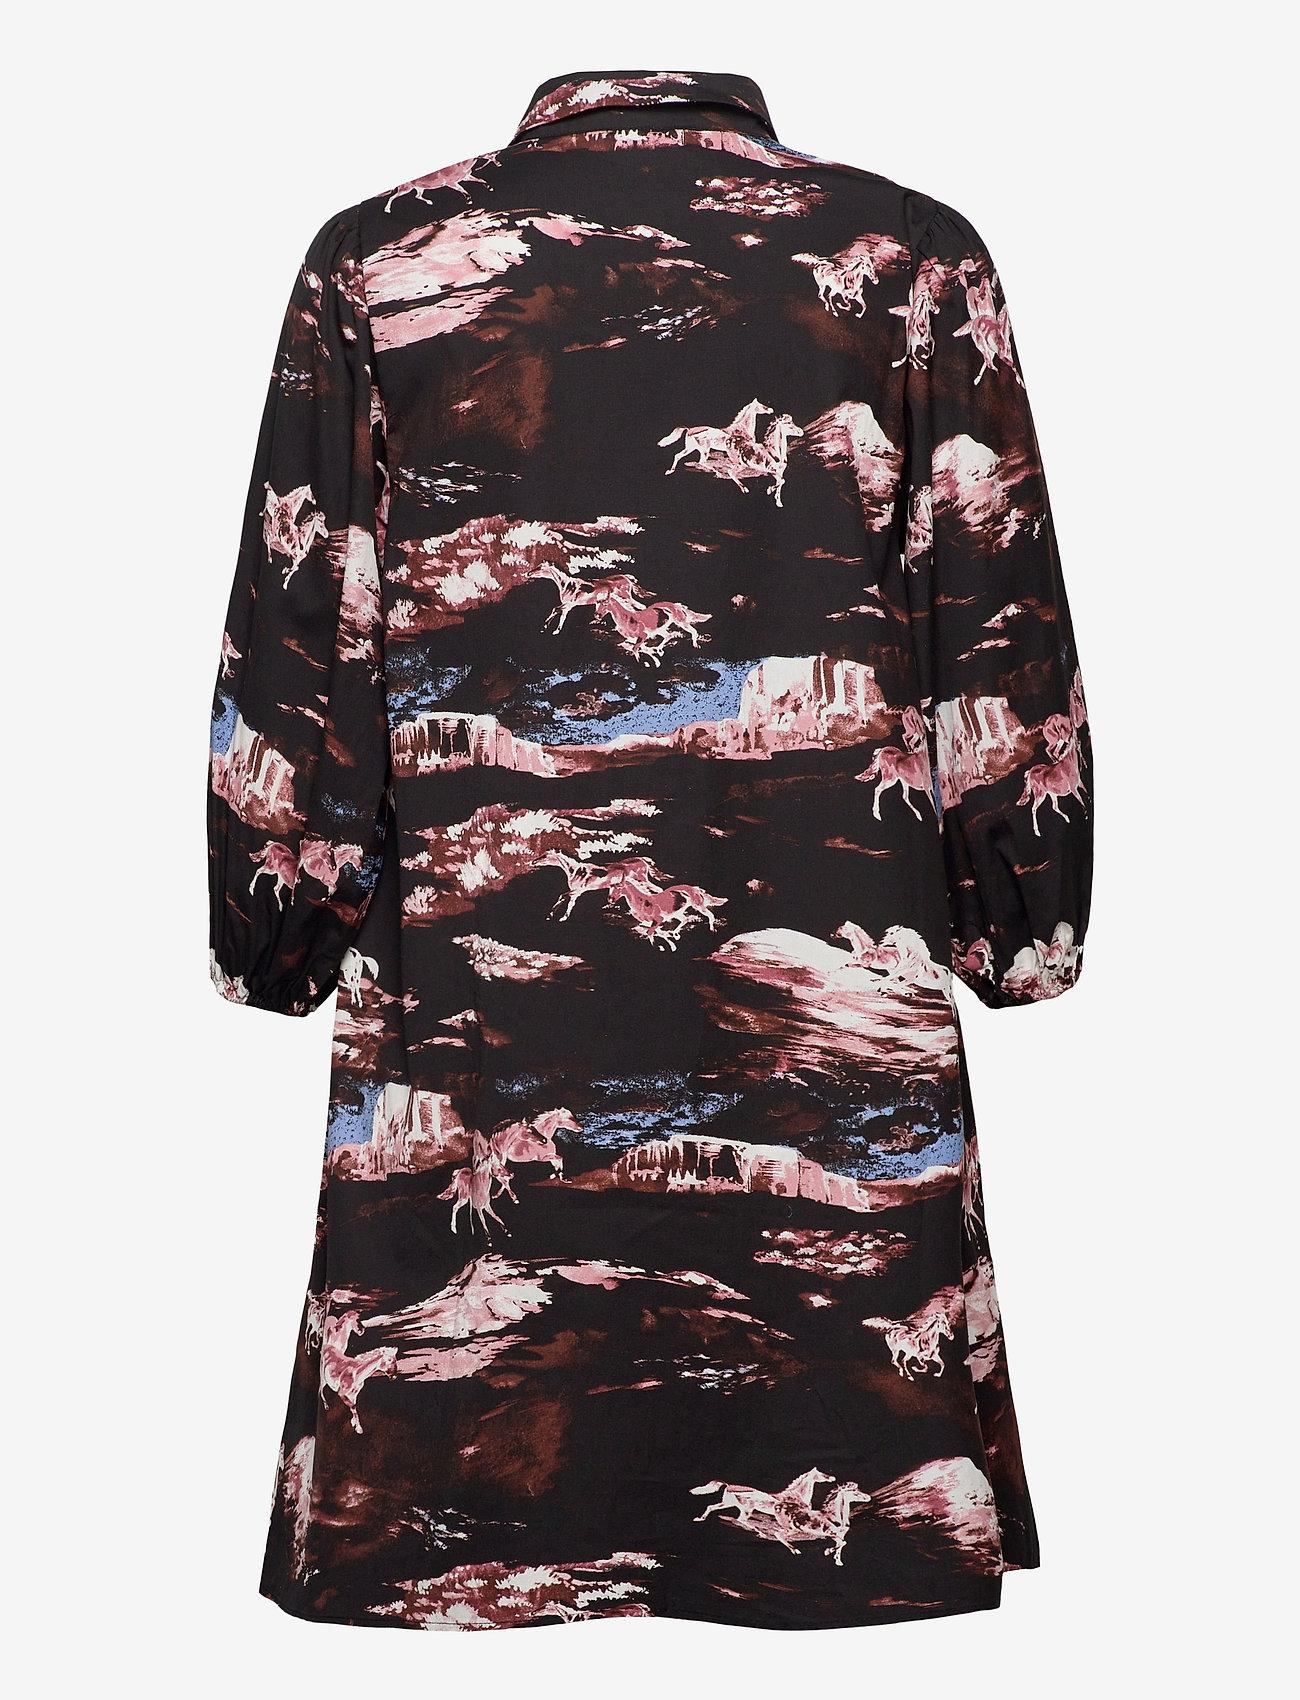 ICHI - IHHADLEY DR - short dresses - black - 1